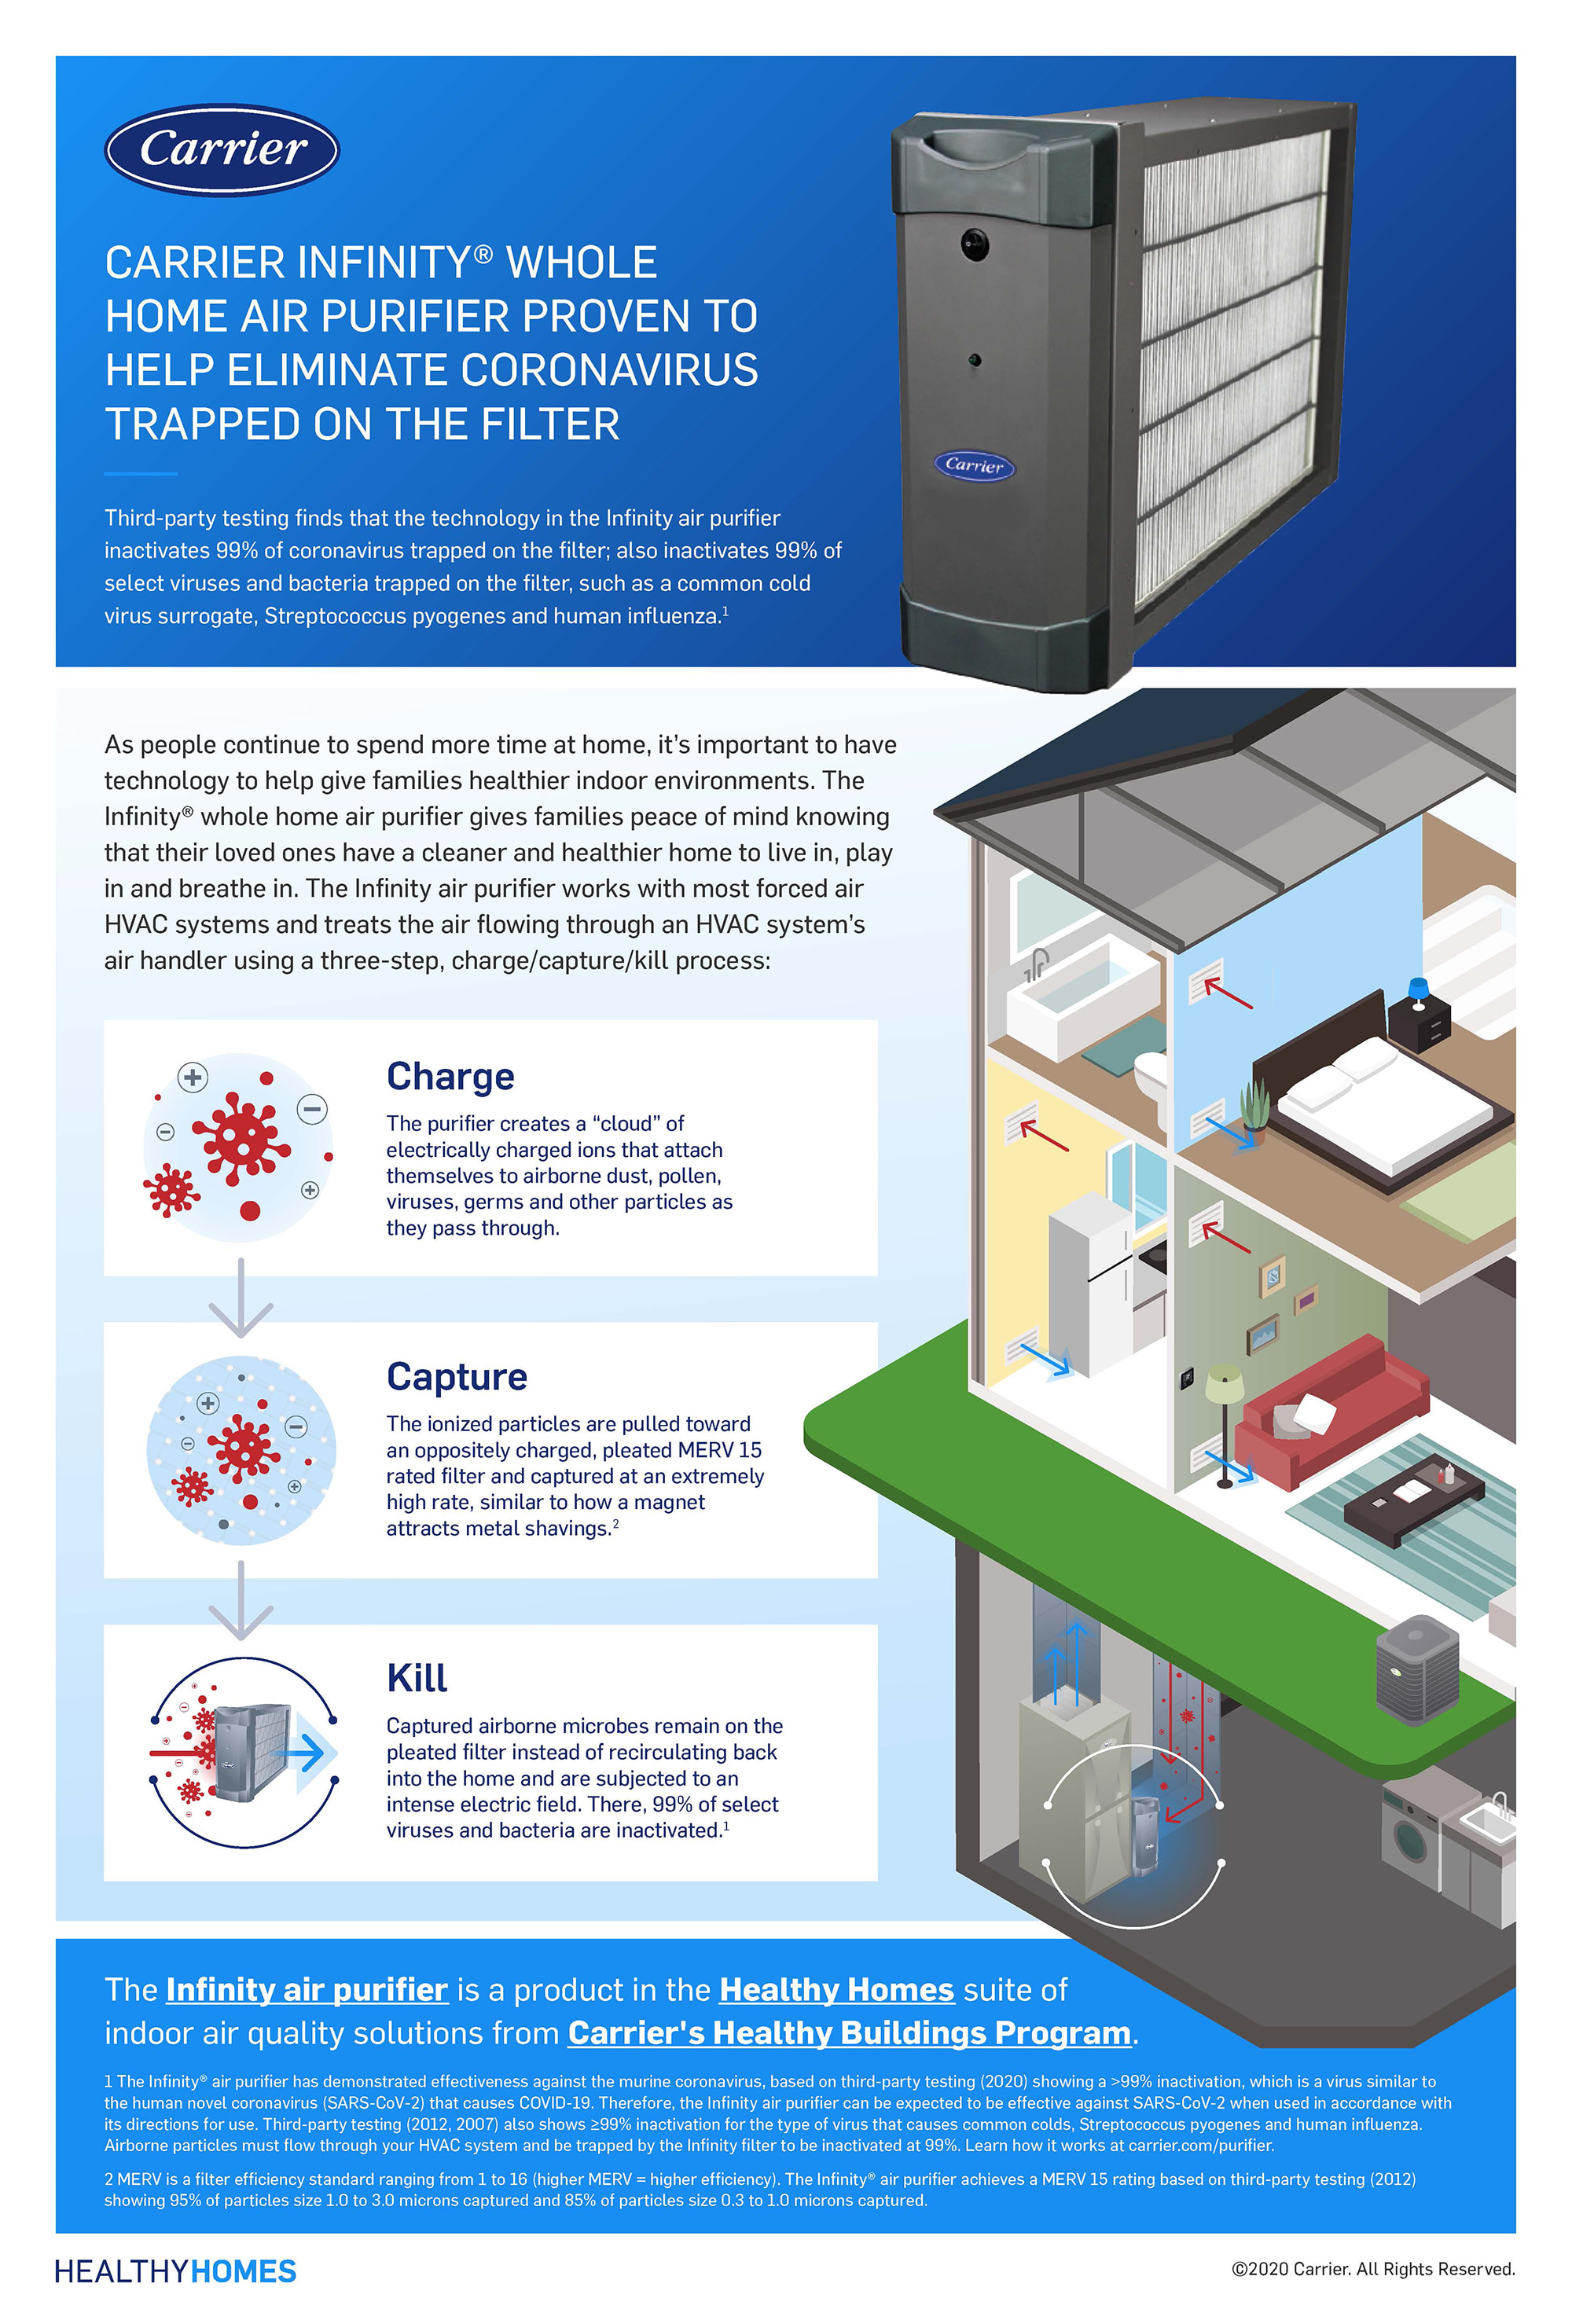 Carrier Infinity Air Purifier Coronavirus Infographic